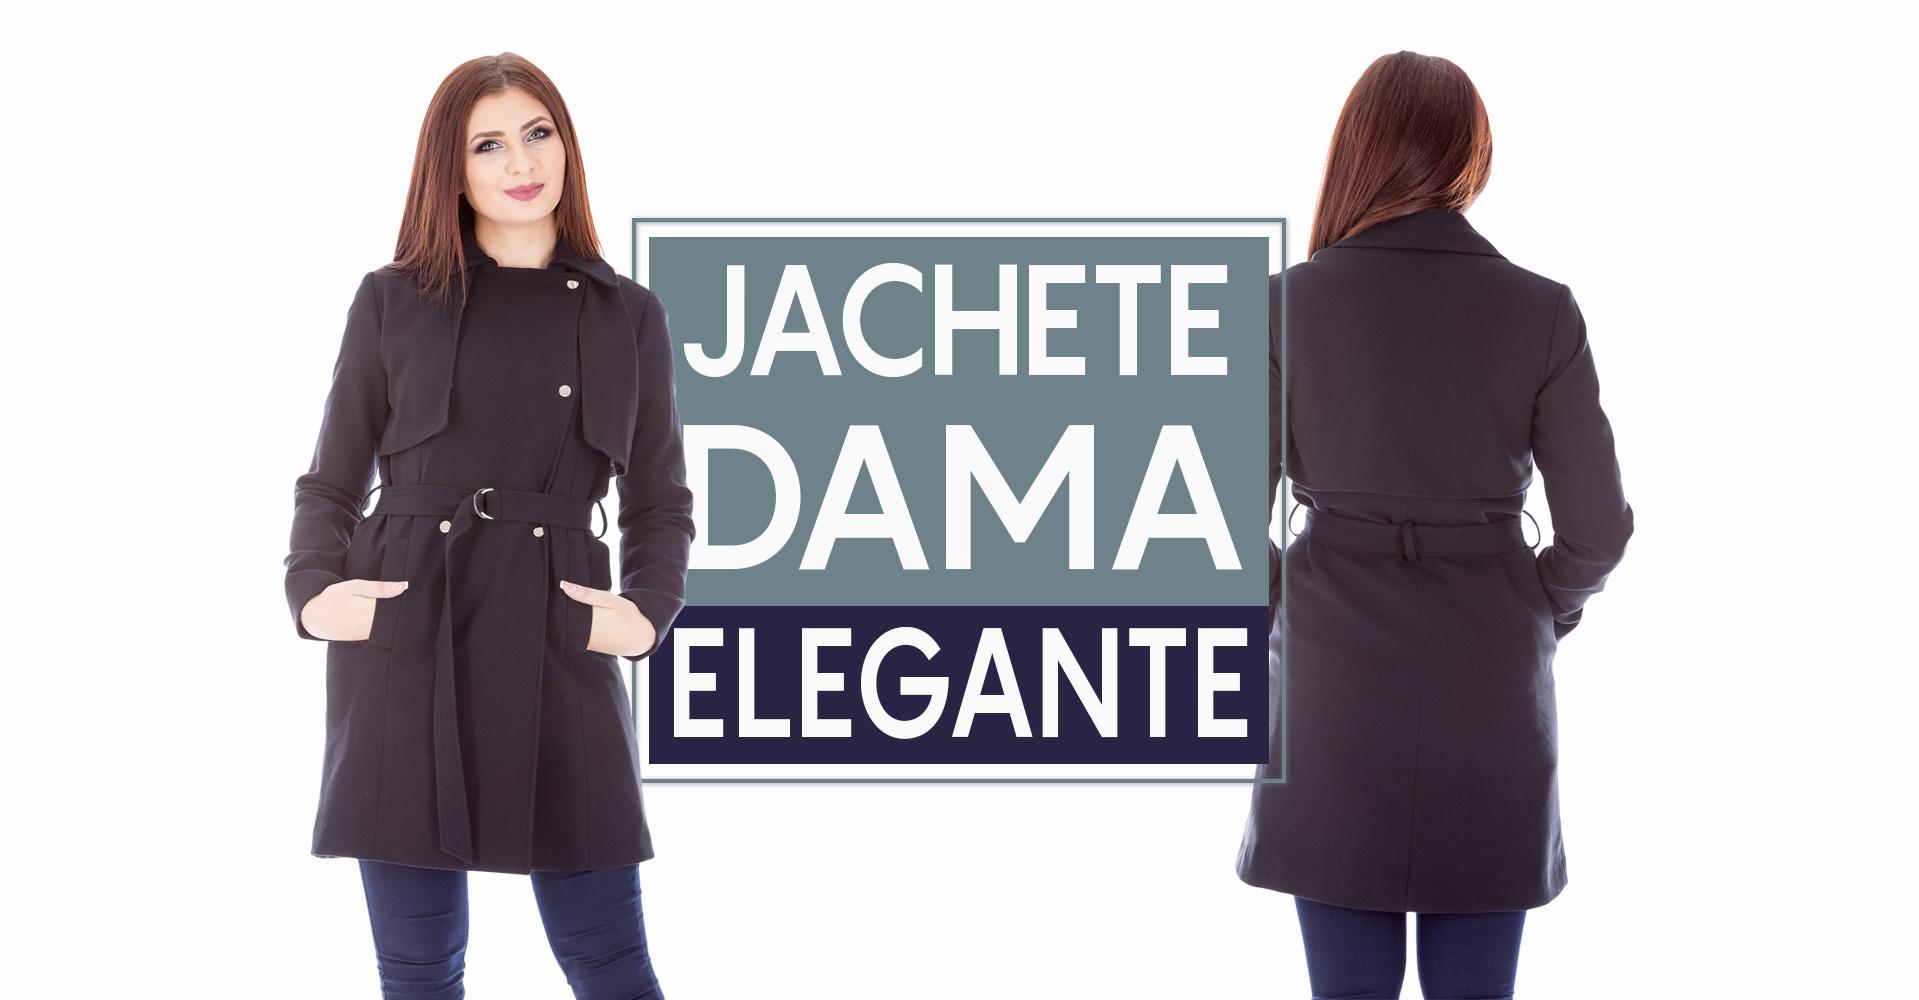 Jachete